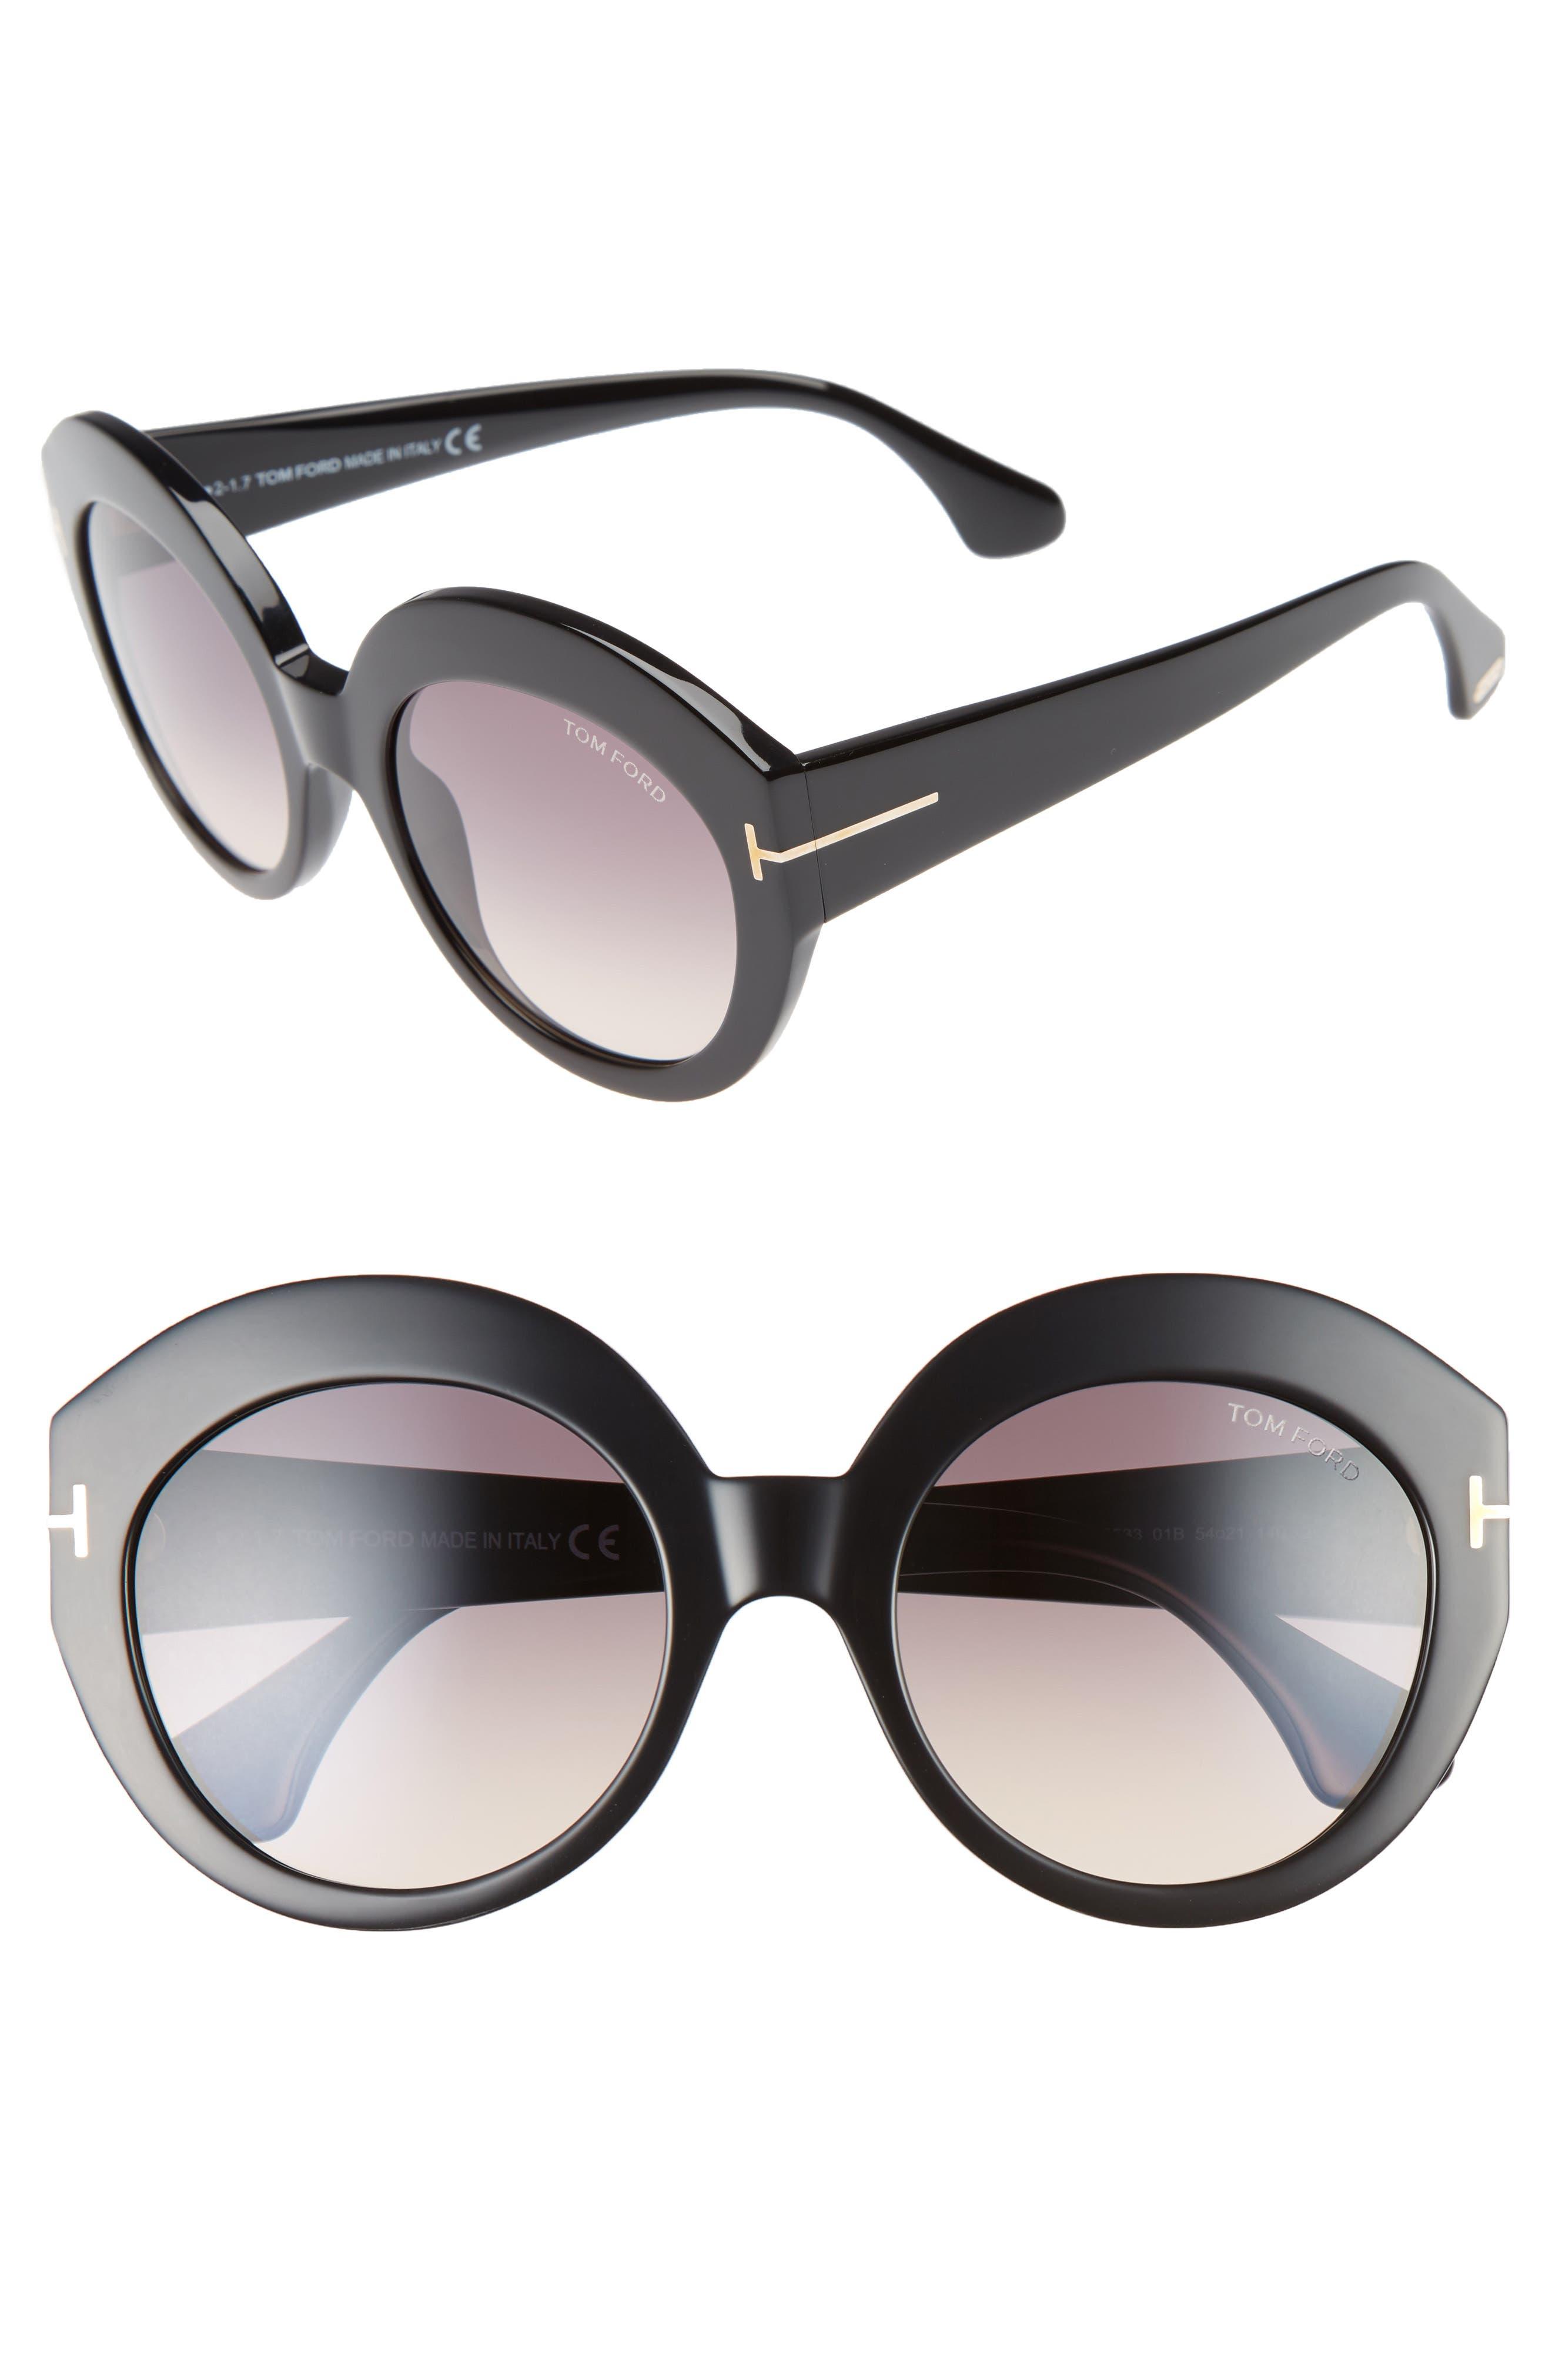 Main Image - Tom Ford Rachel 54mm Gradient Lens Sunglasses